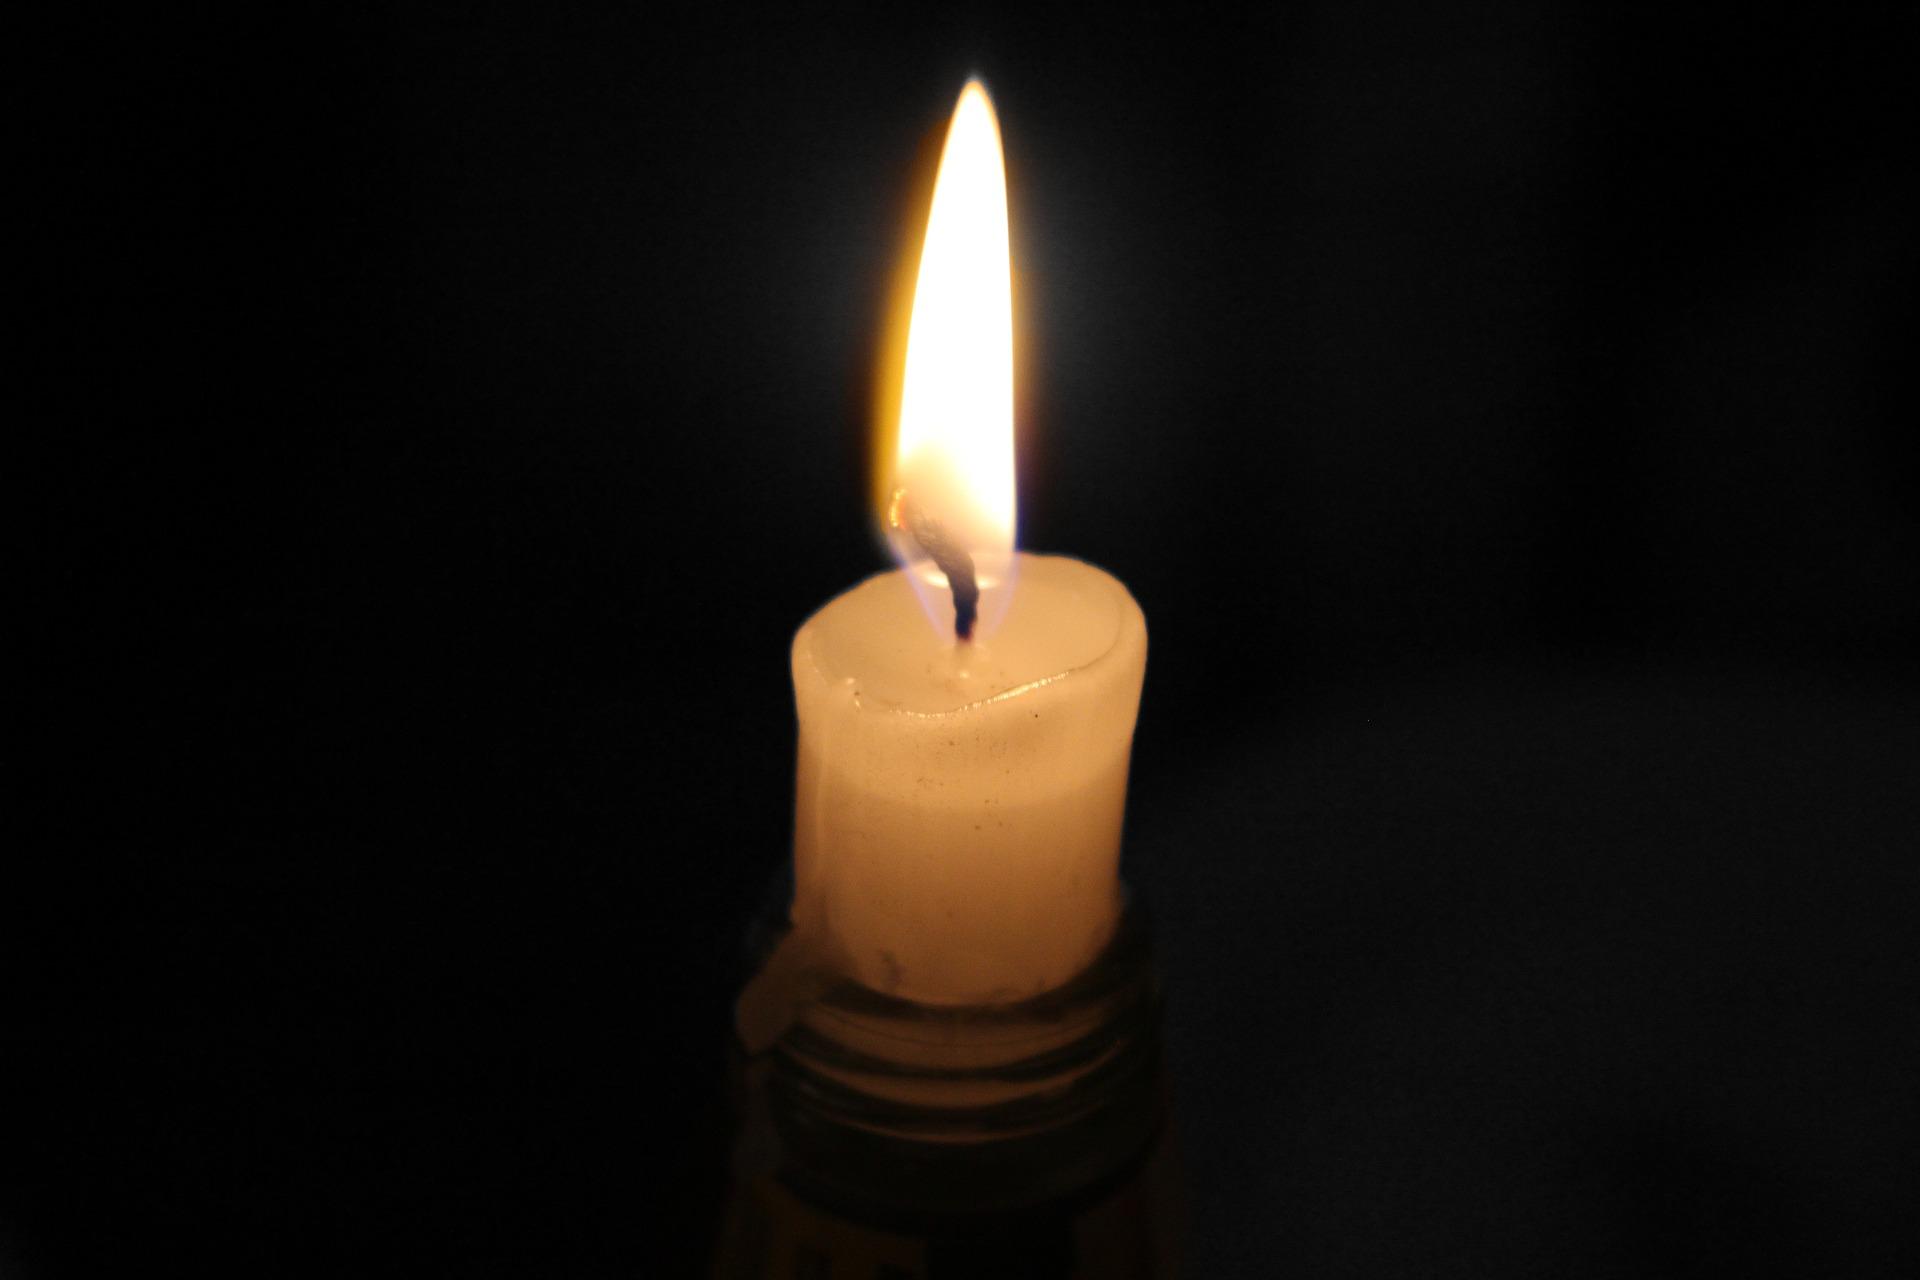 A burning candle.